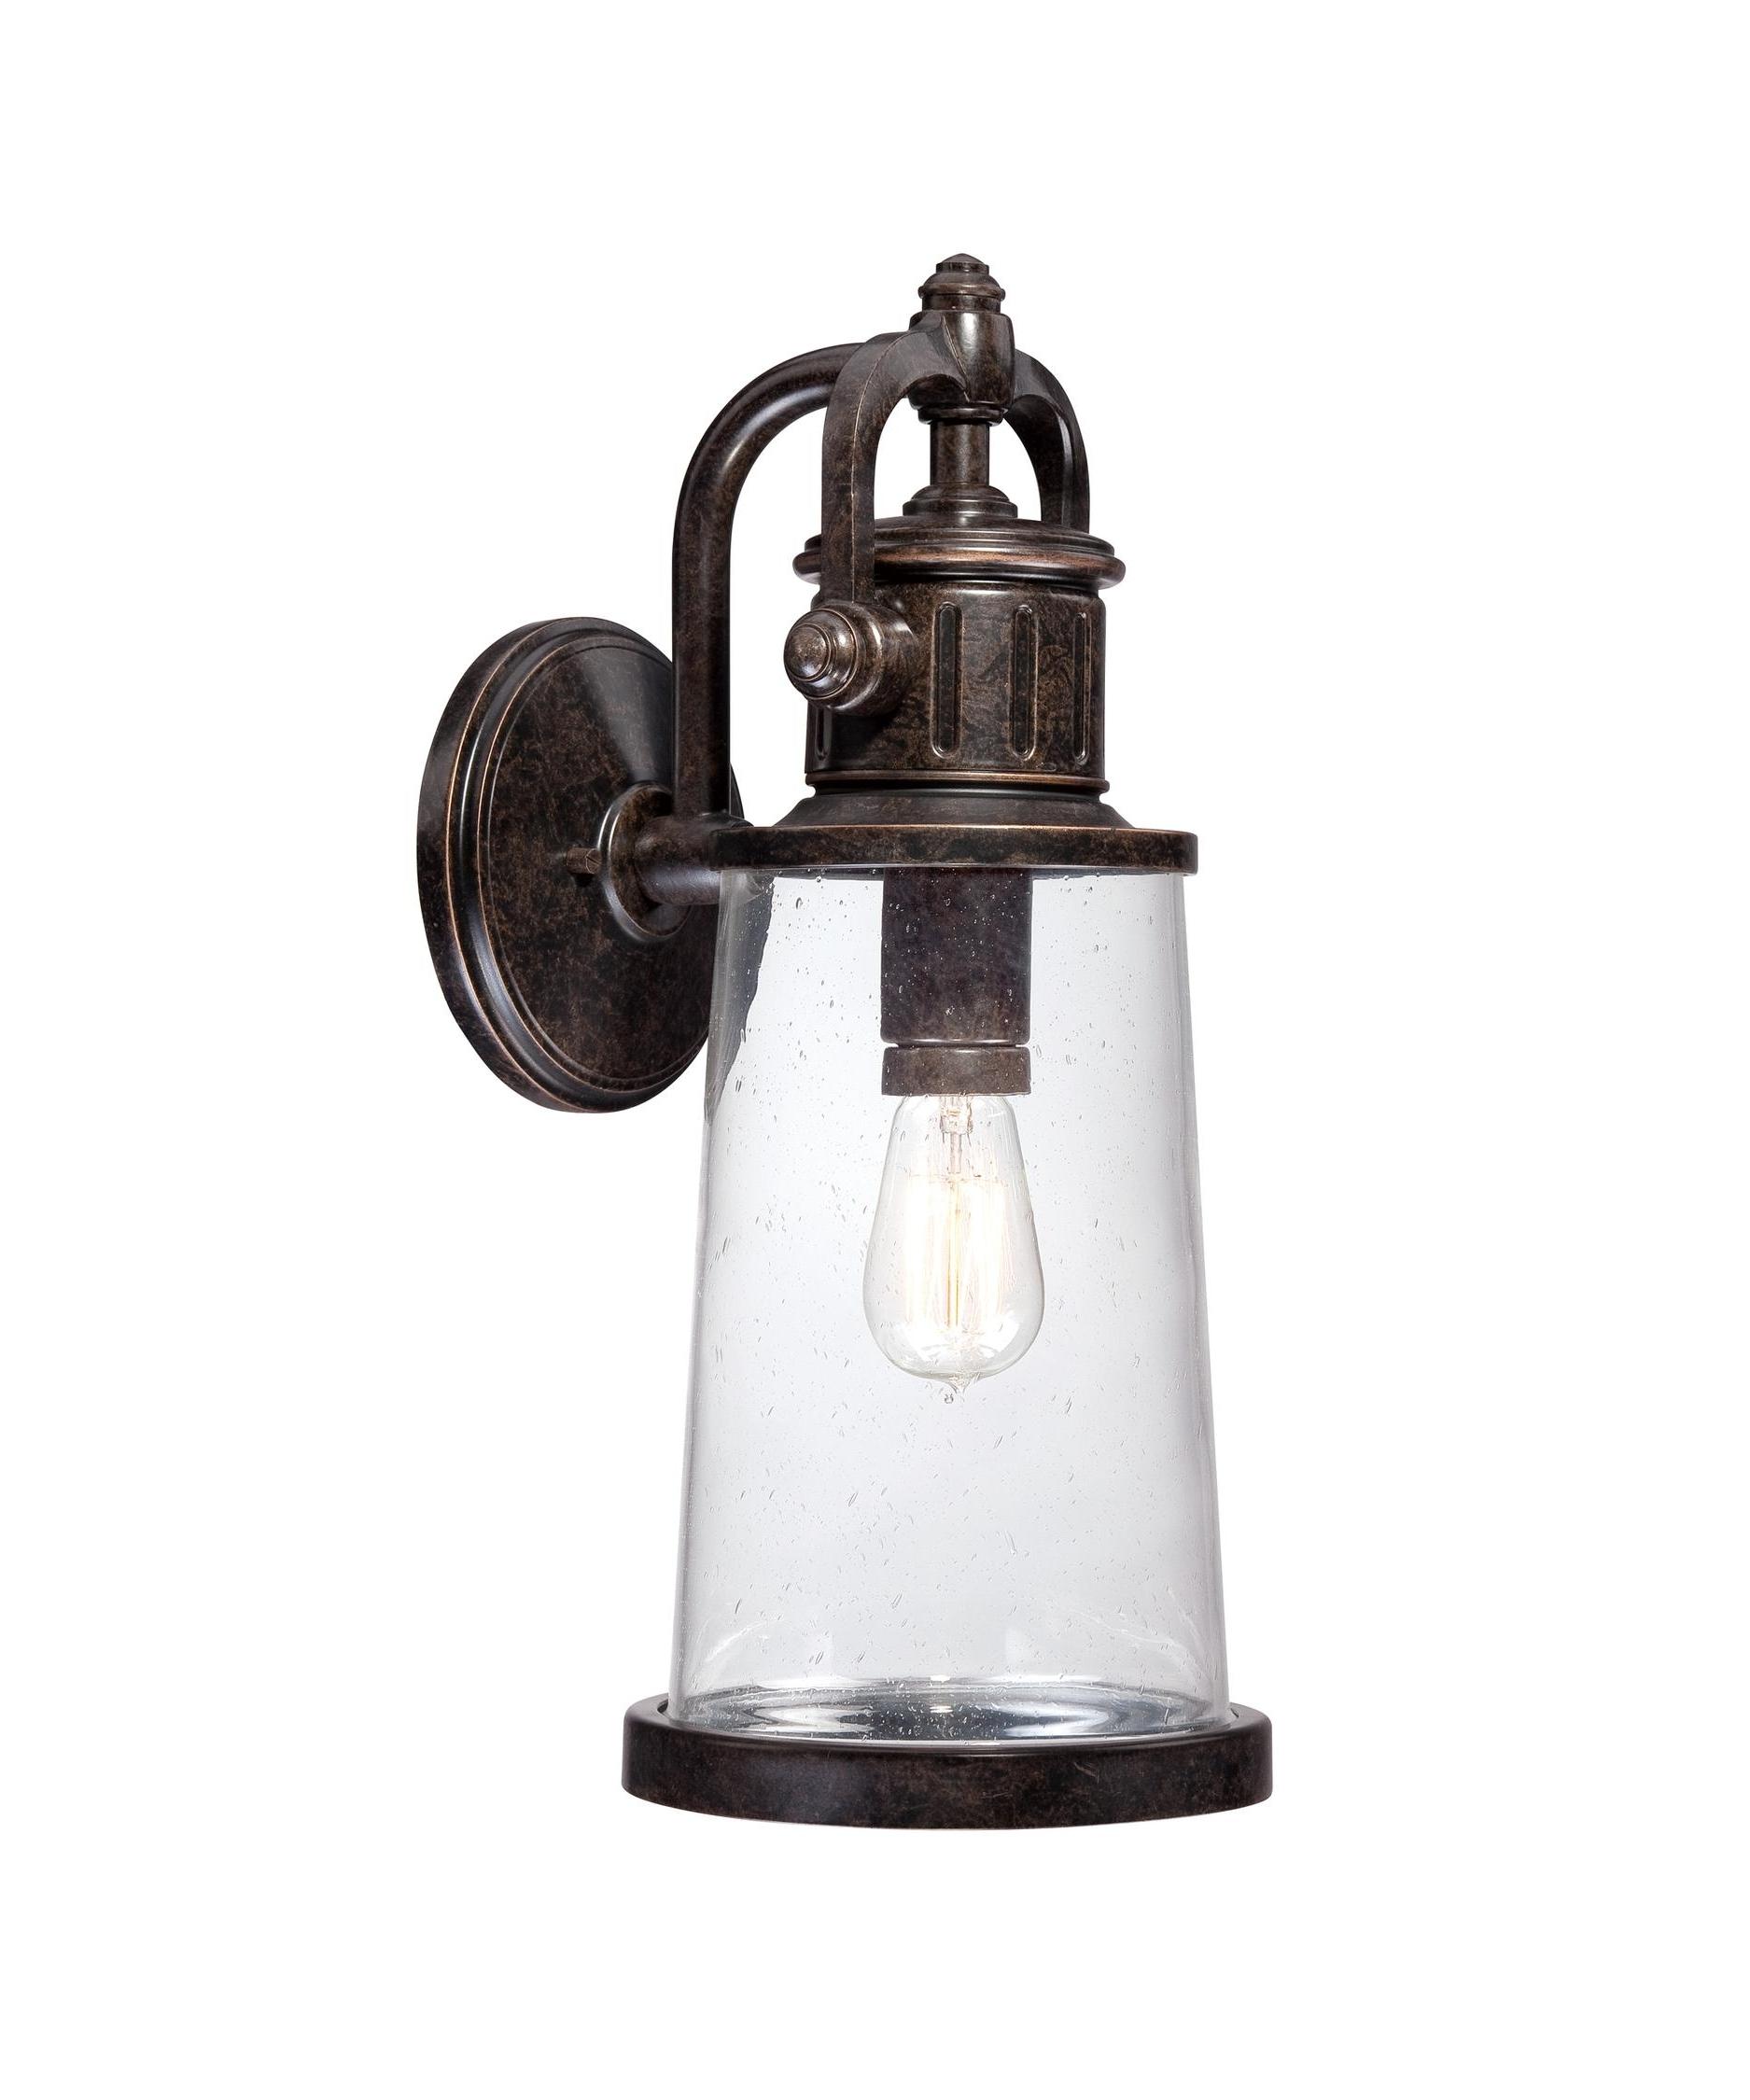 2018 Quoizel Sdn8408 Steadman 8 Inch Wide 1 Light Outdoor Wall Light Inside Quoizel Outdoor Lanterns (Gallery 7 of 20)